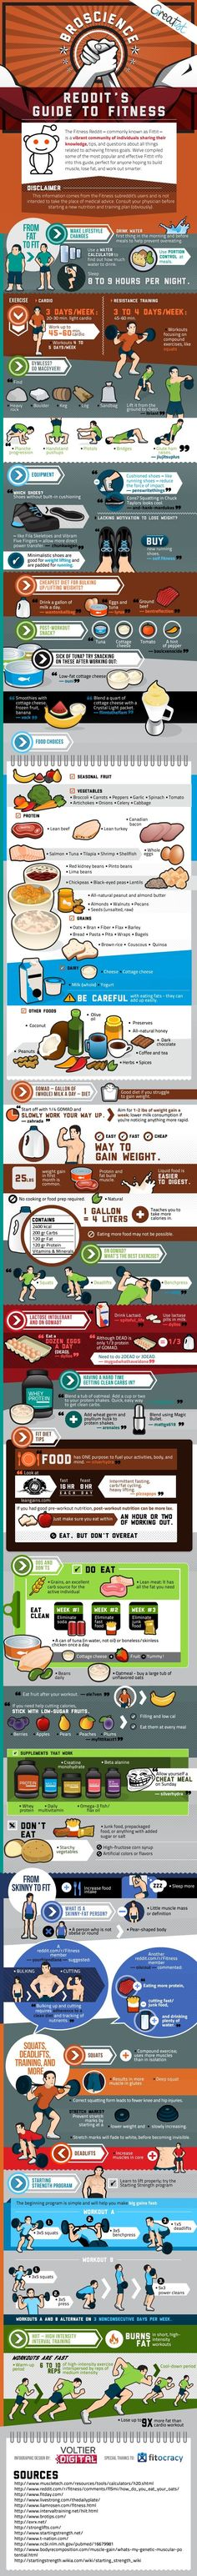 Reddit's Guide to Fitness, men's health, bulk up, eat better, workout: